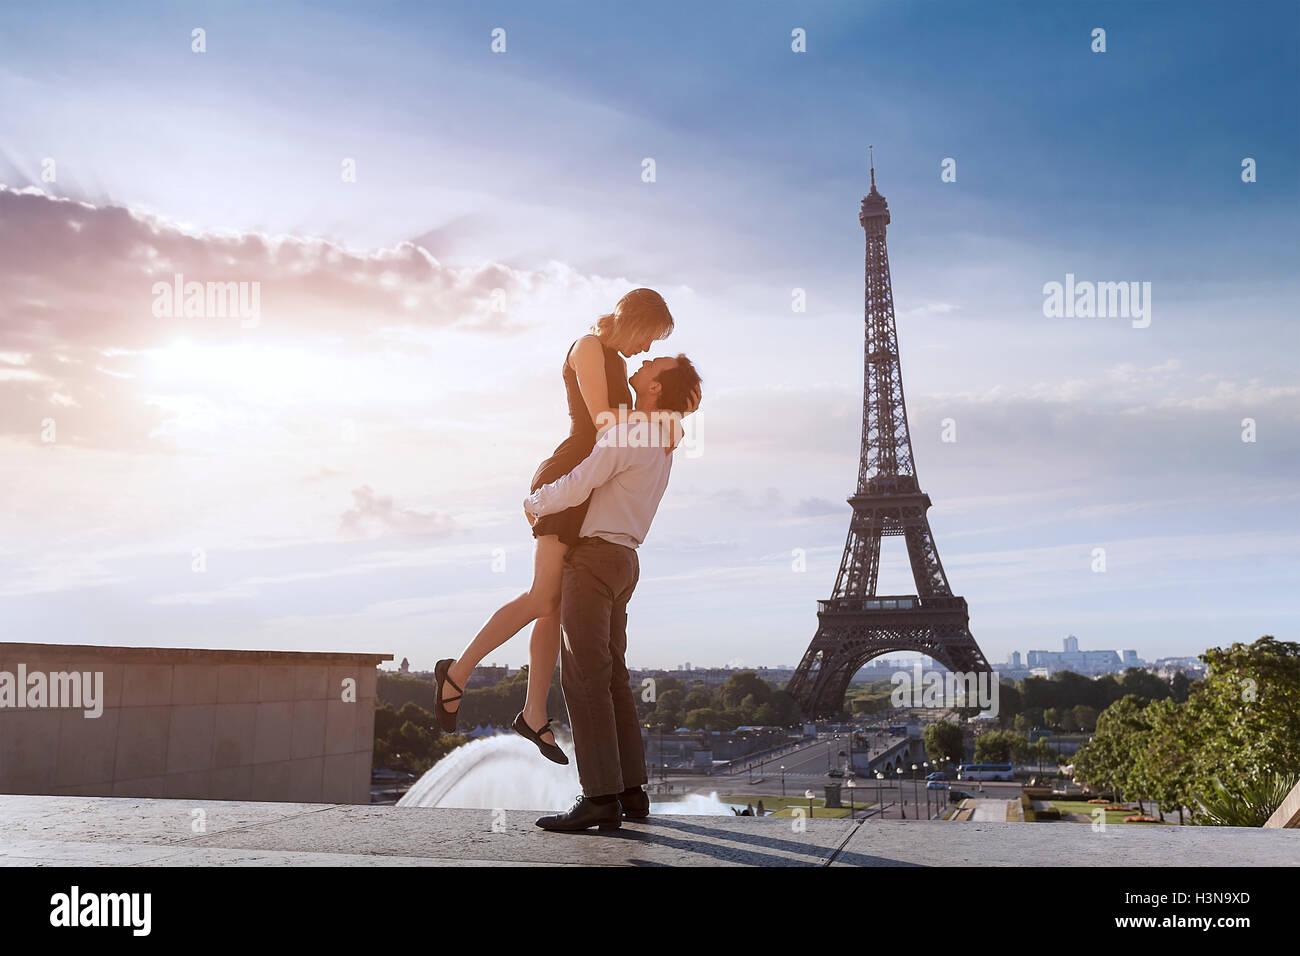 Cheerful romantic couple at trocadero near eiffel tower - Stock Image